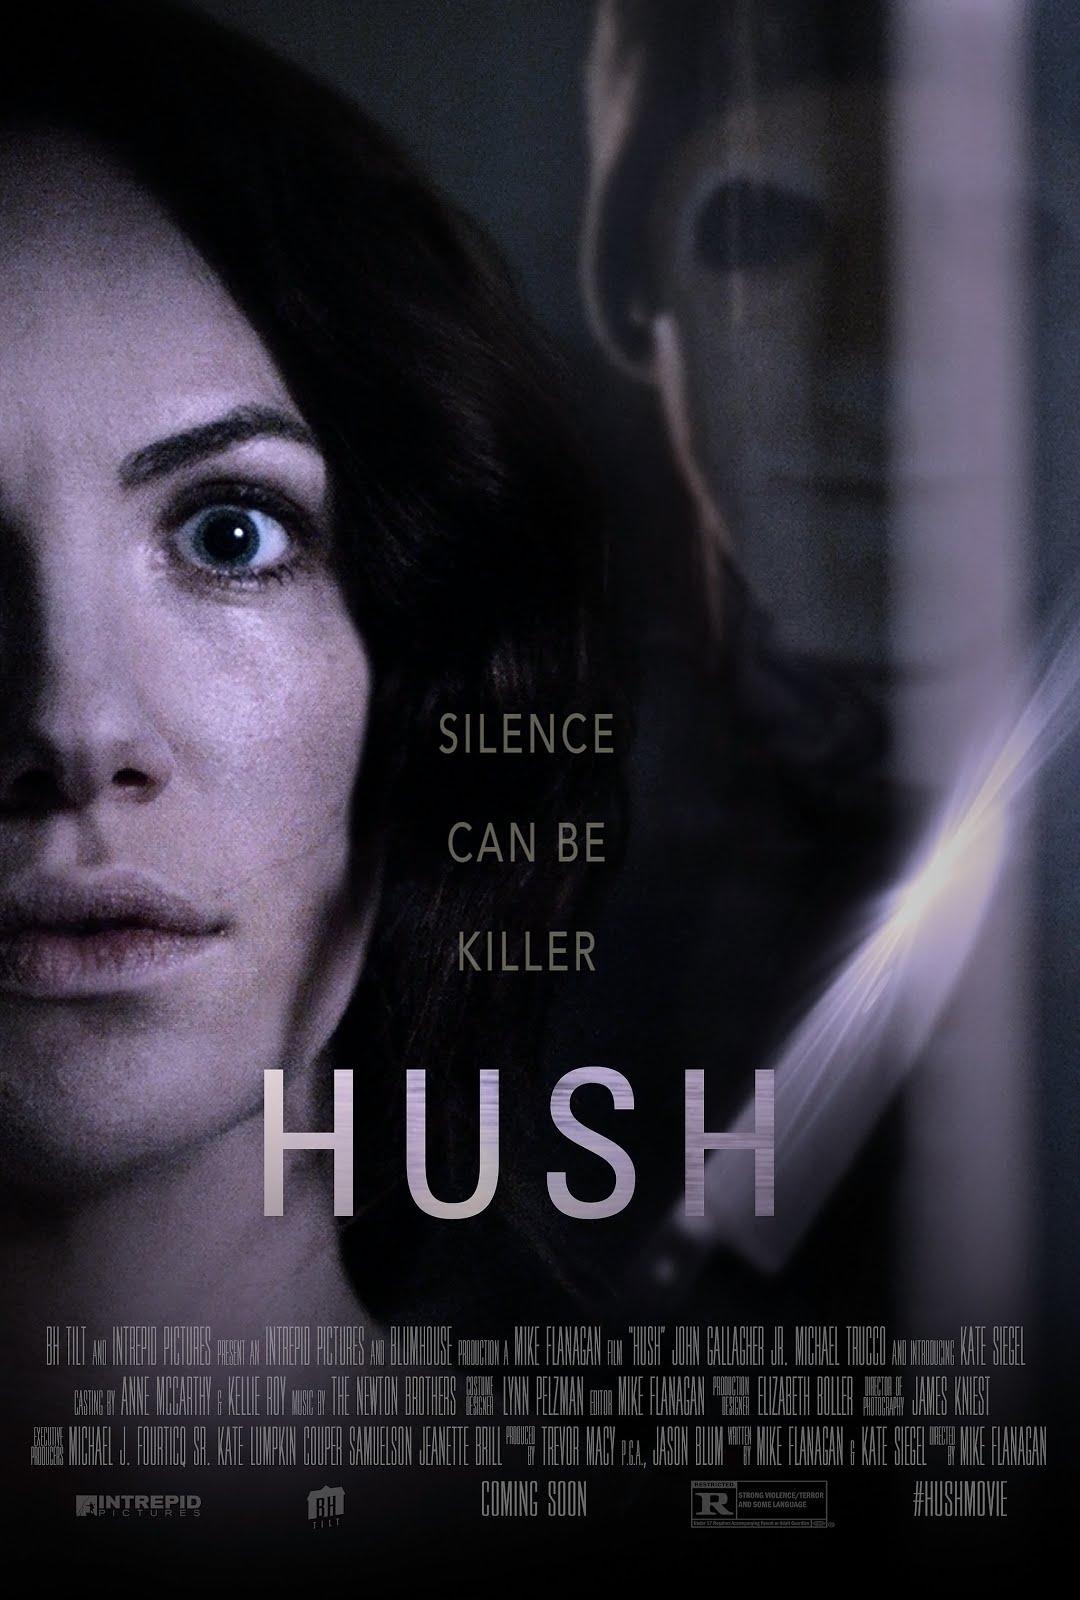 2. Hush